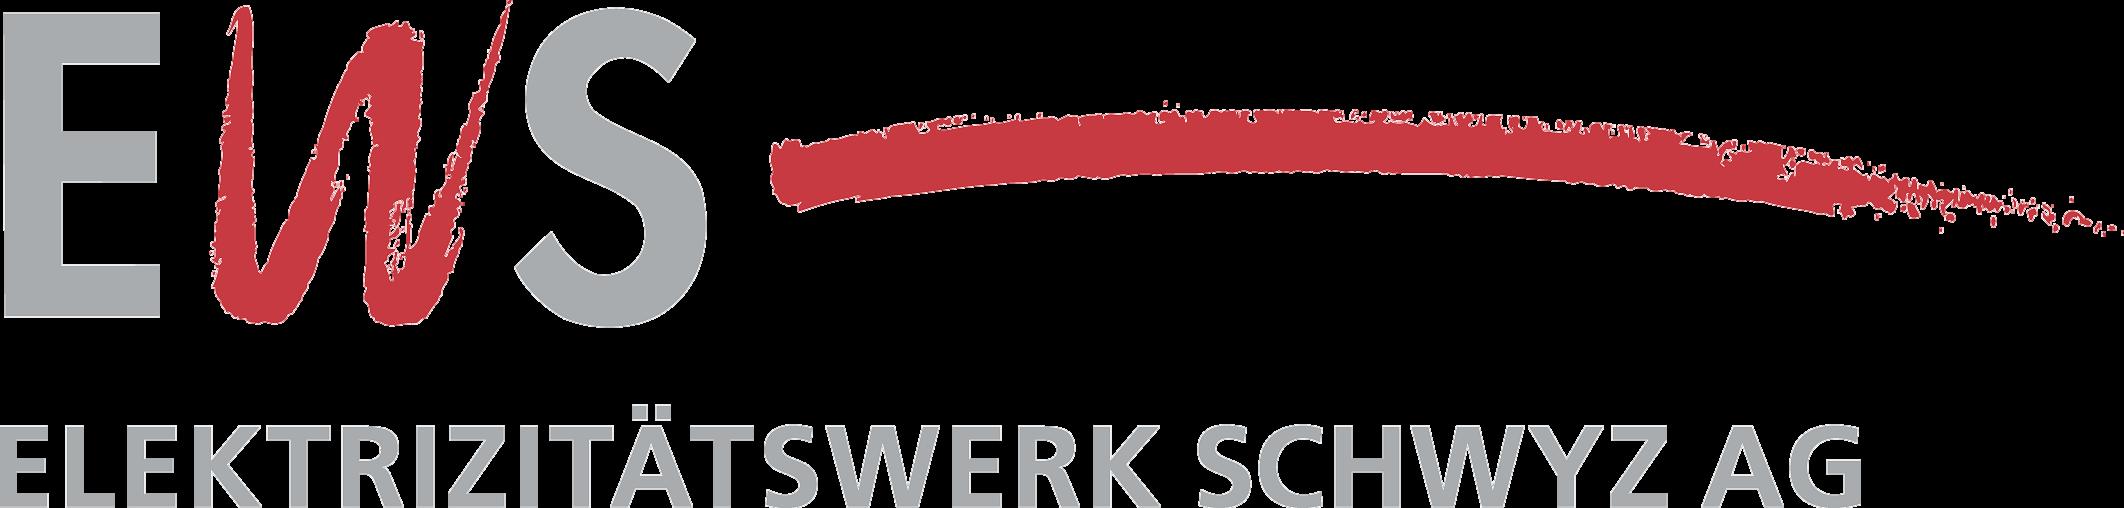 EWS Elektrizitätswerk Schwyz AG